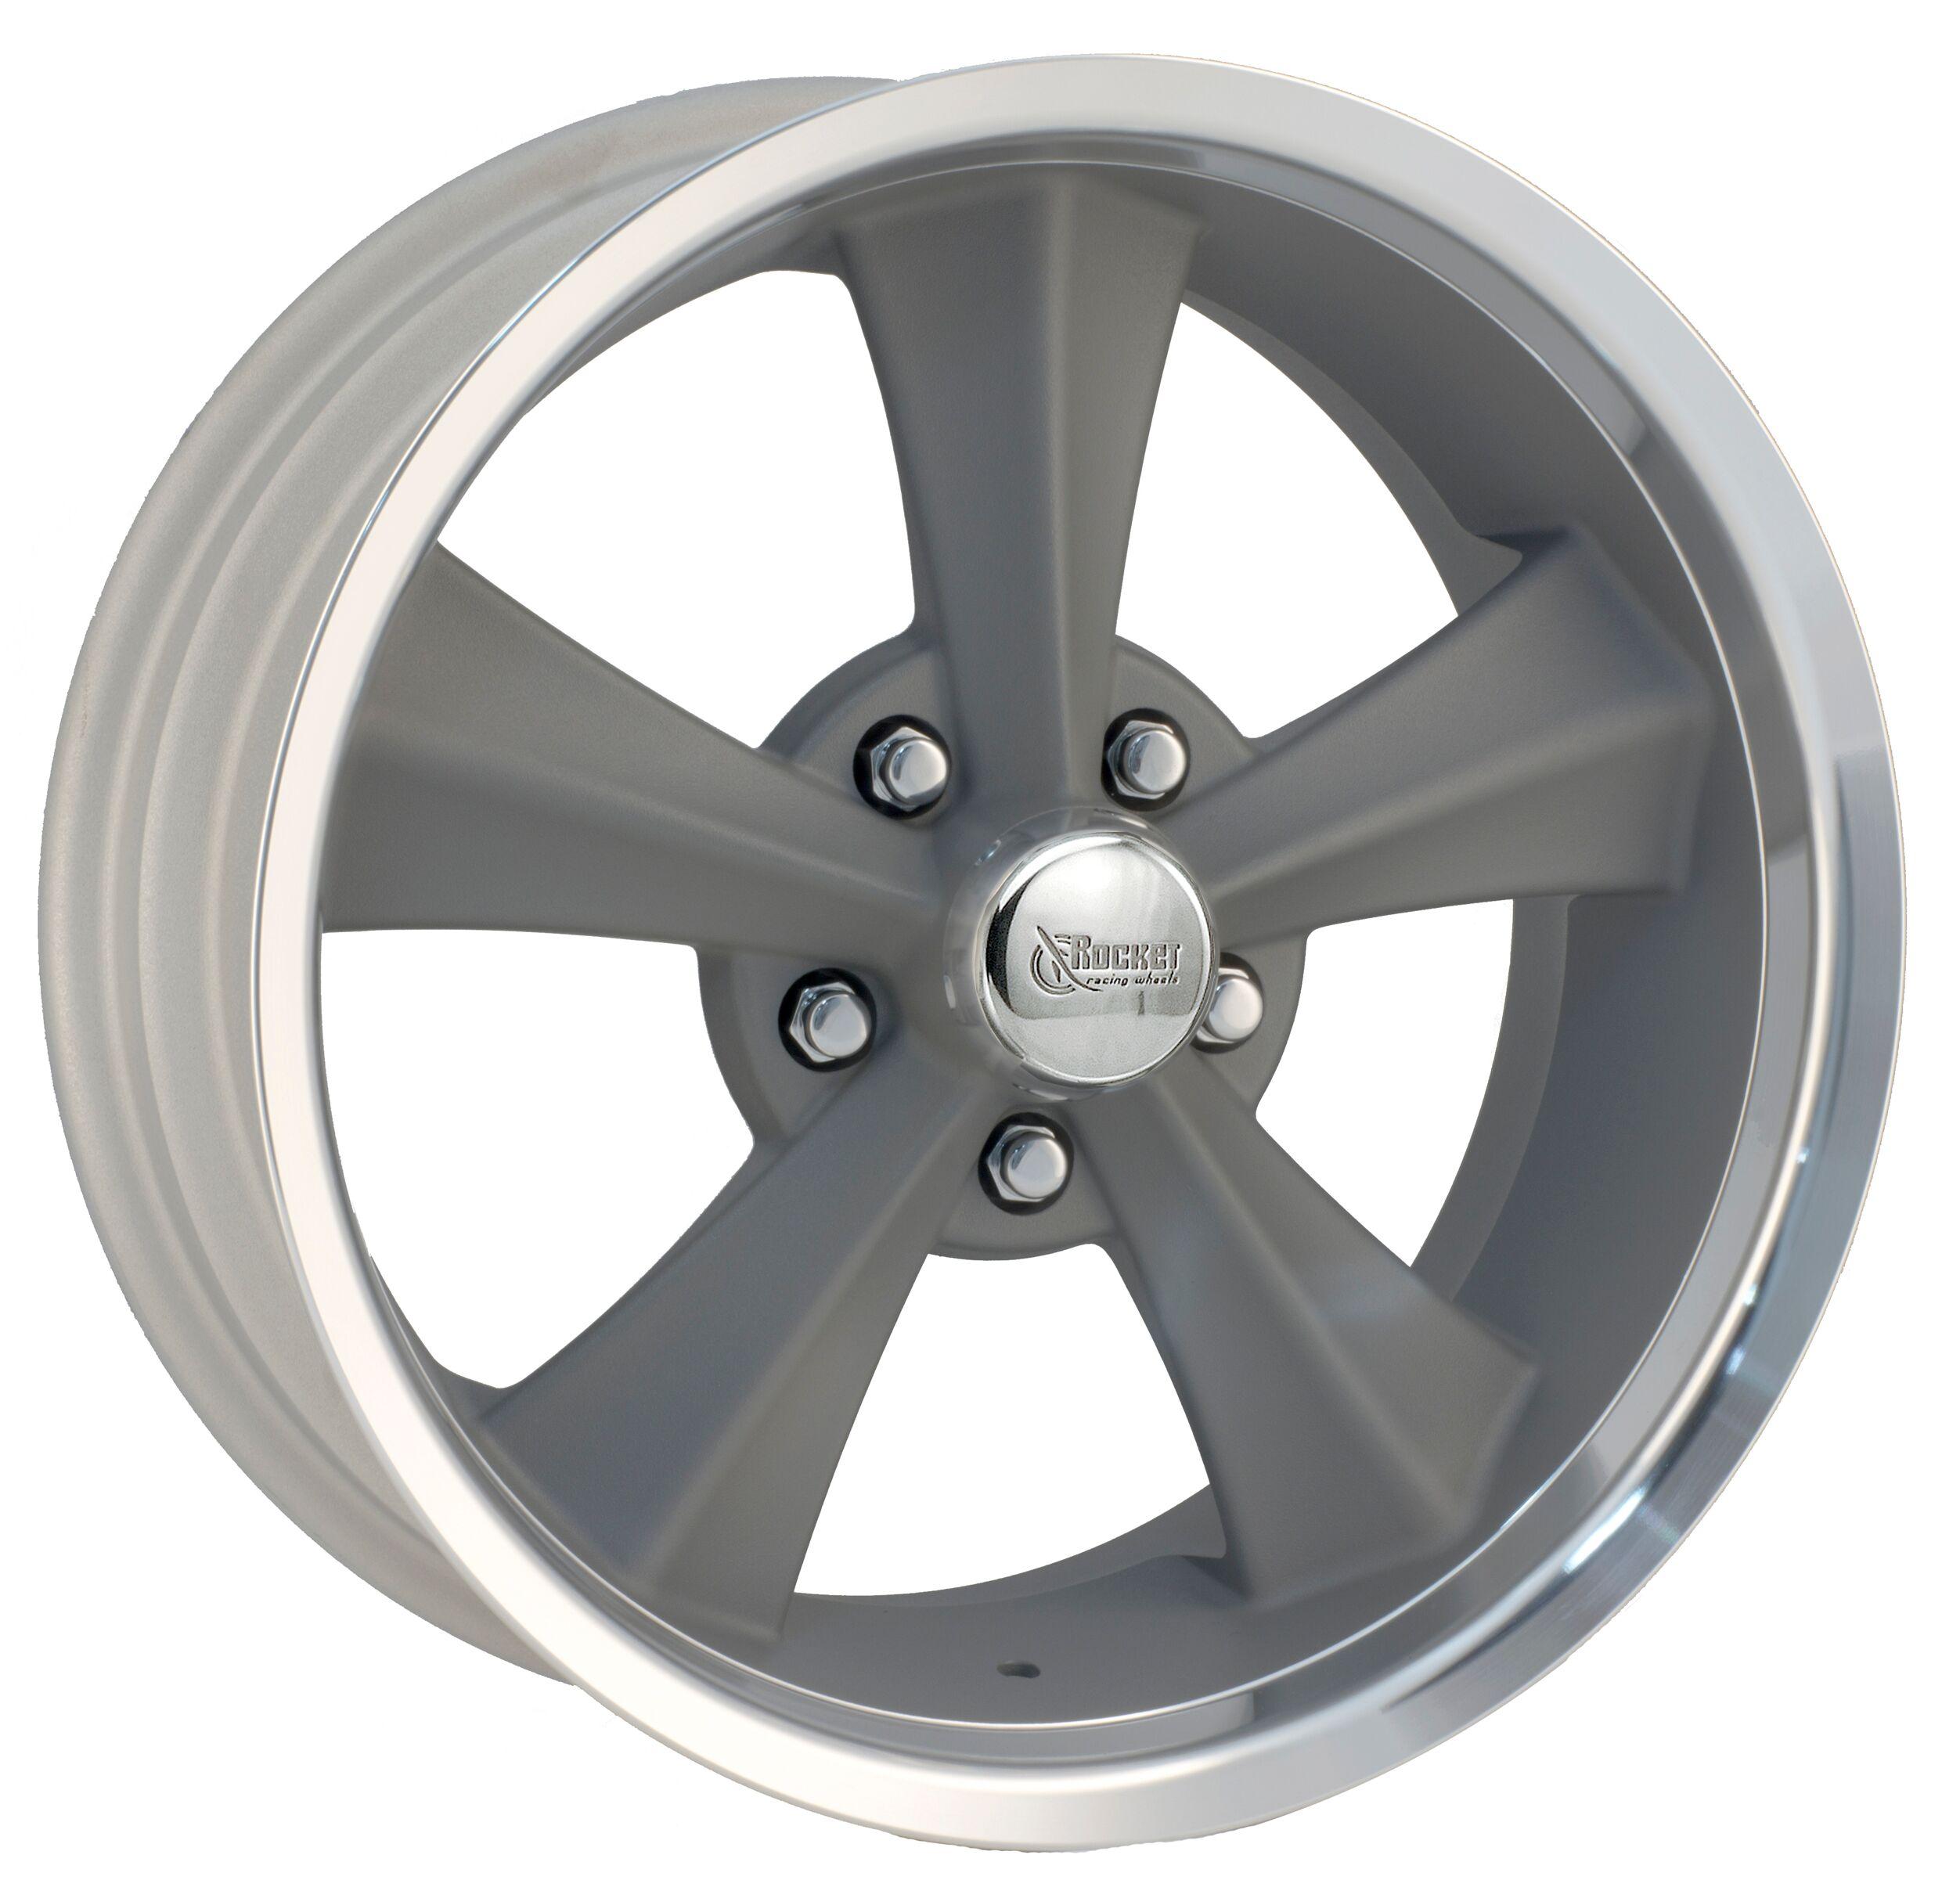 Rocket Racing Wheels Booster - Gray Paint Center / Machined Lip Rim